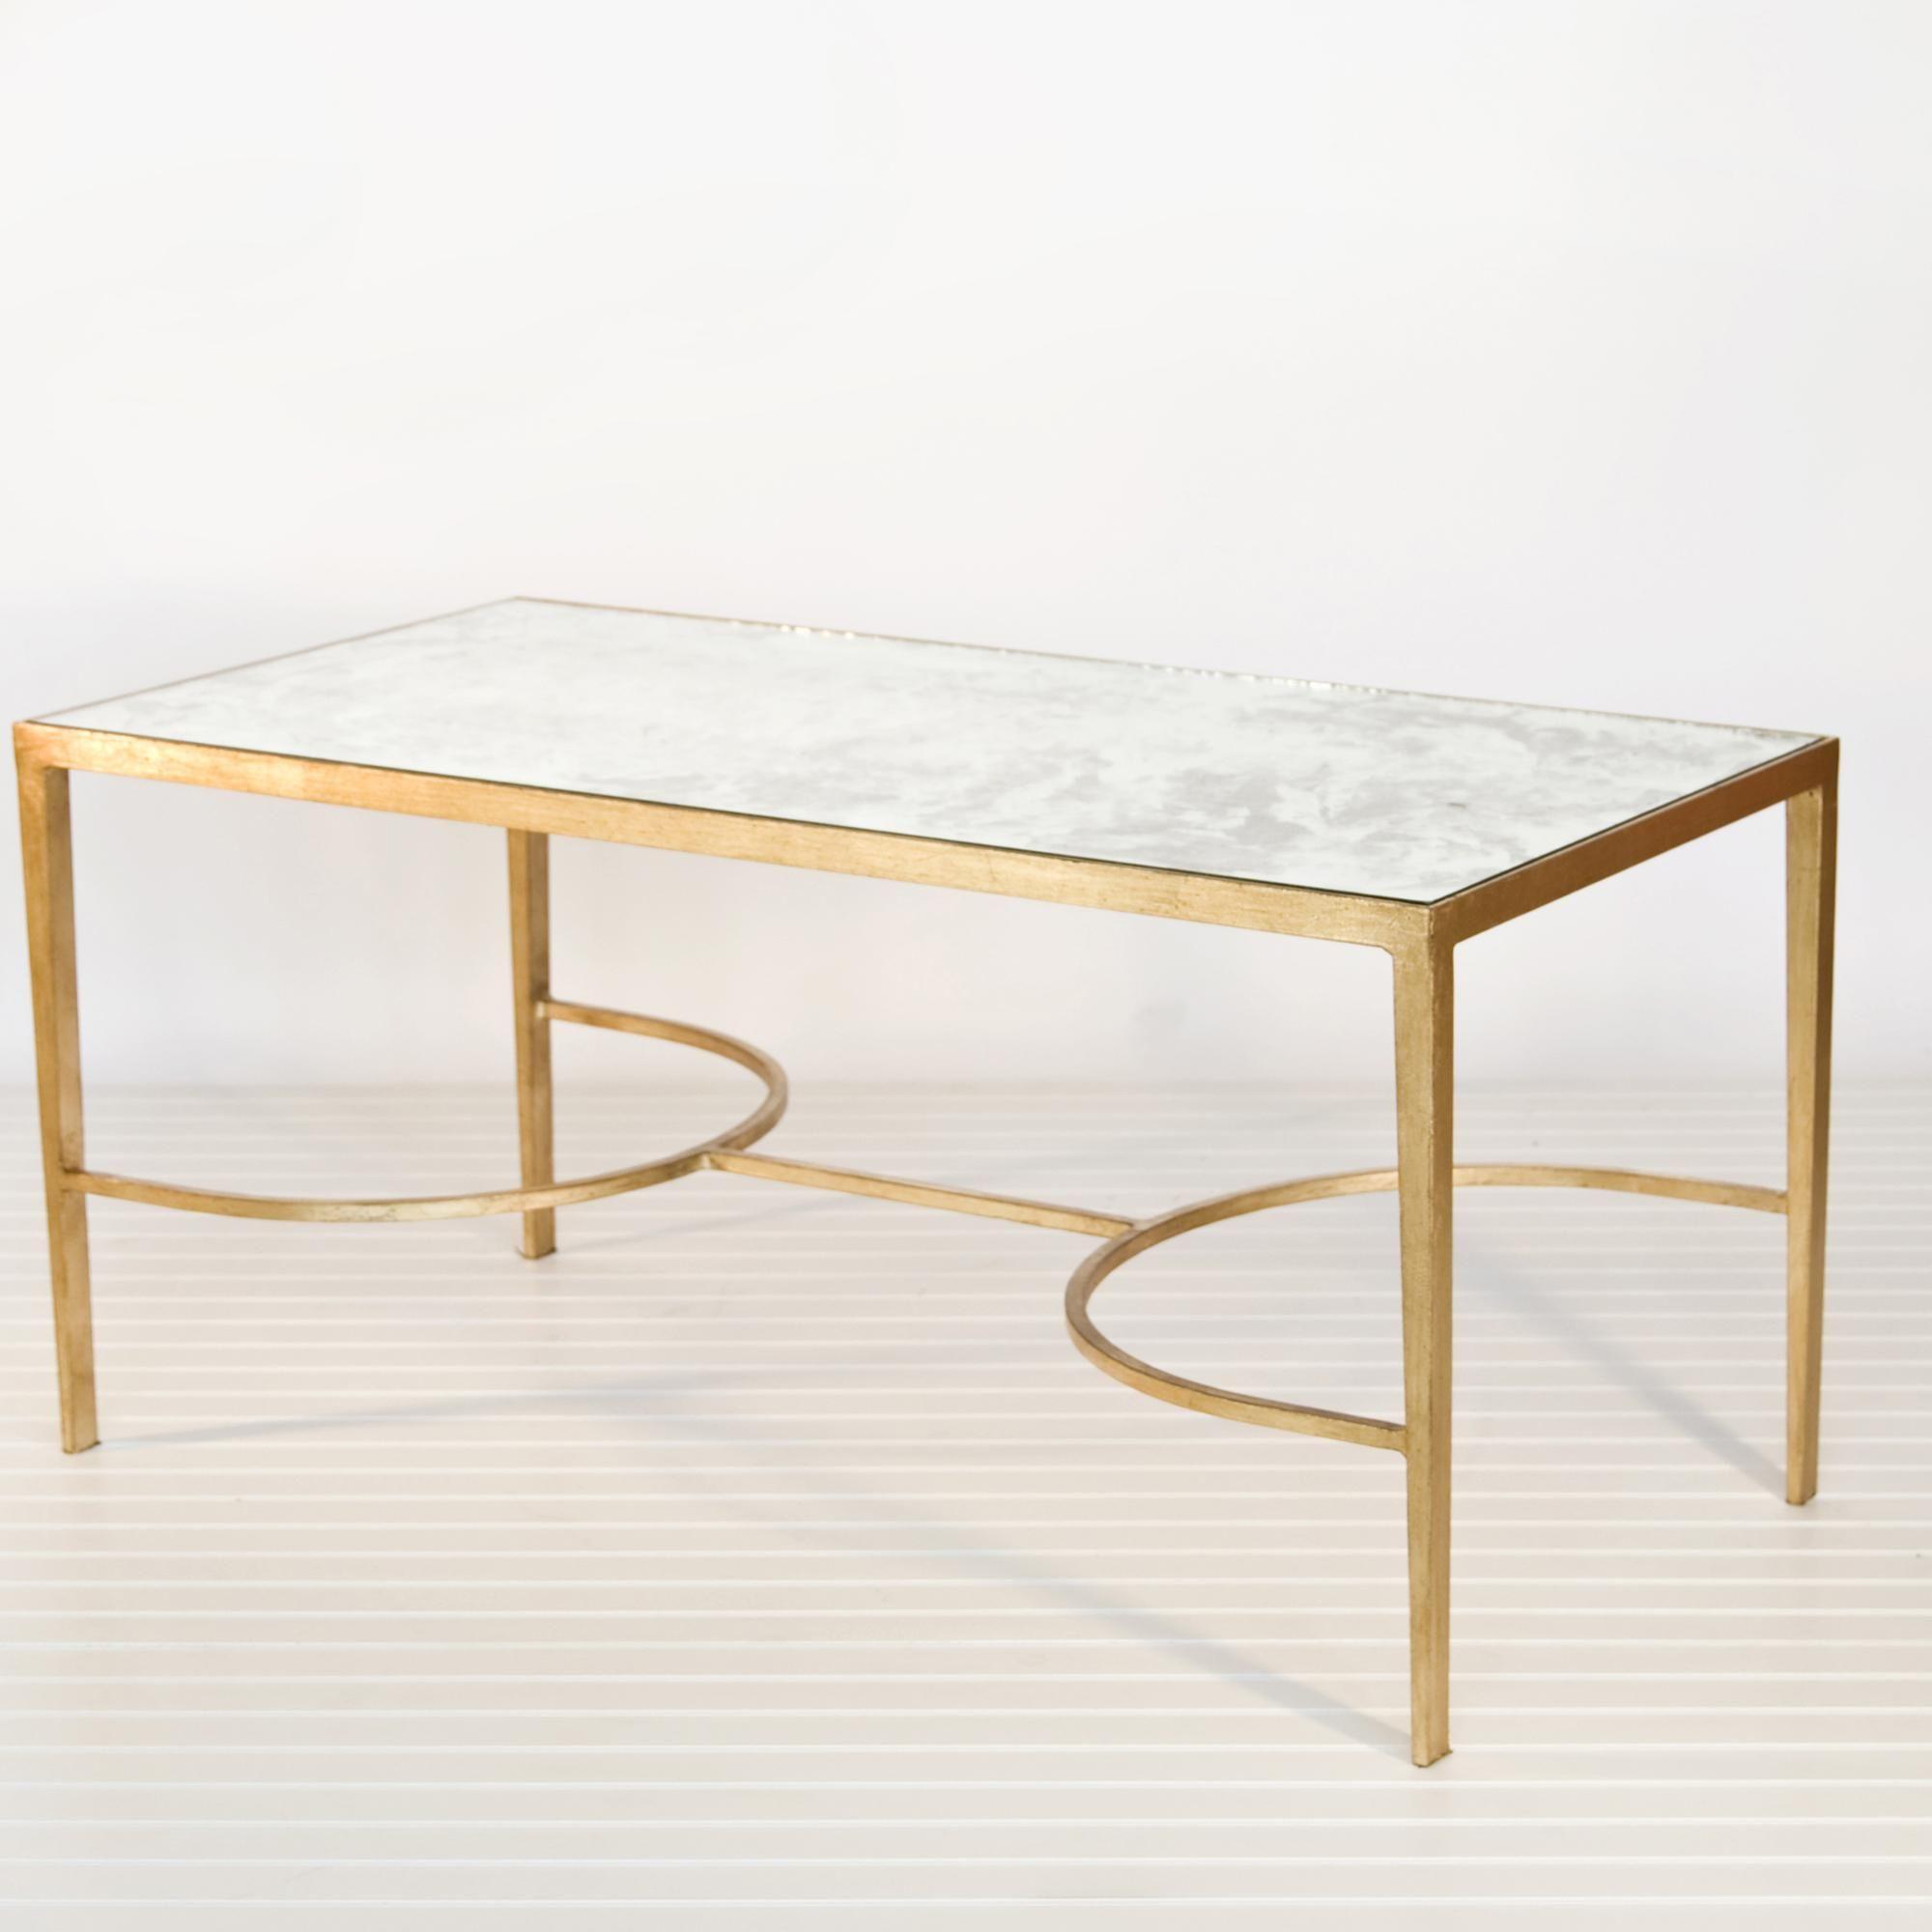 Coffee Table Legs Gold: Best 25+ Coffee Table Gold Legs Ideas On Pinterest